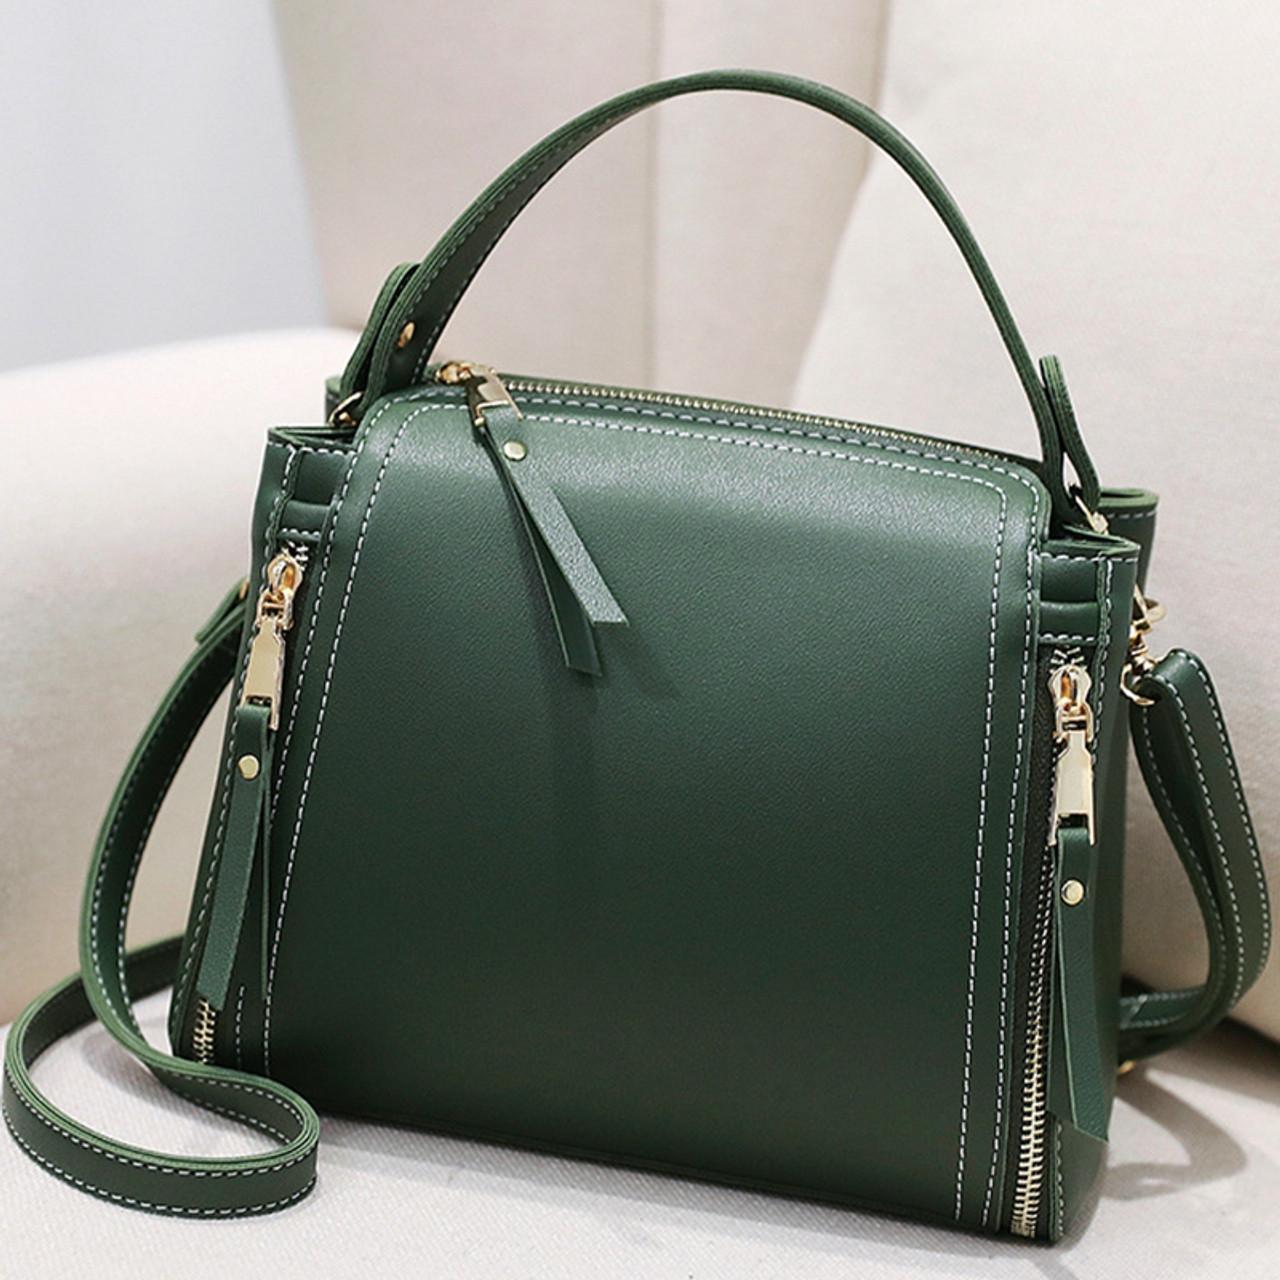 9ac0ca139d29 Small Mini Bucket Women Messenger Bags With Long Strap Designer Crossbody  Bags Green Shoulder Bags Female ...